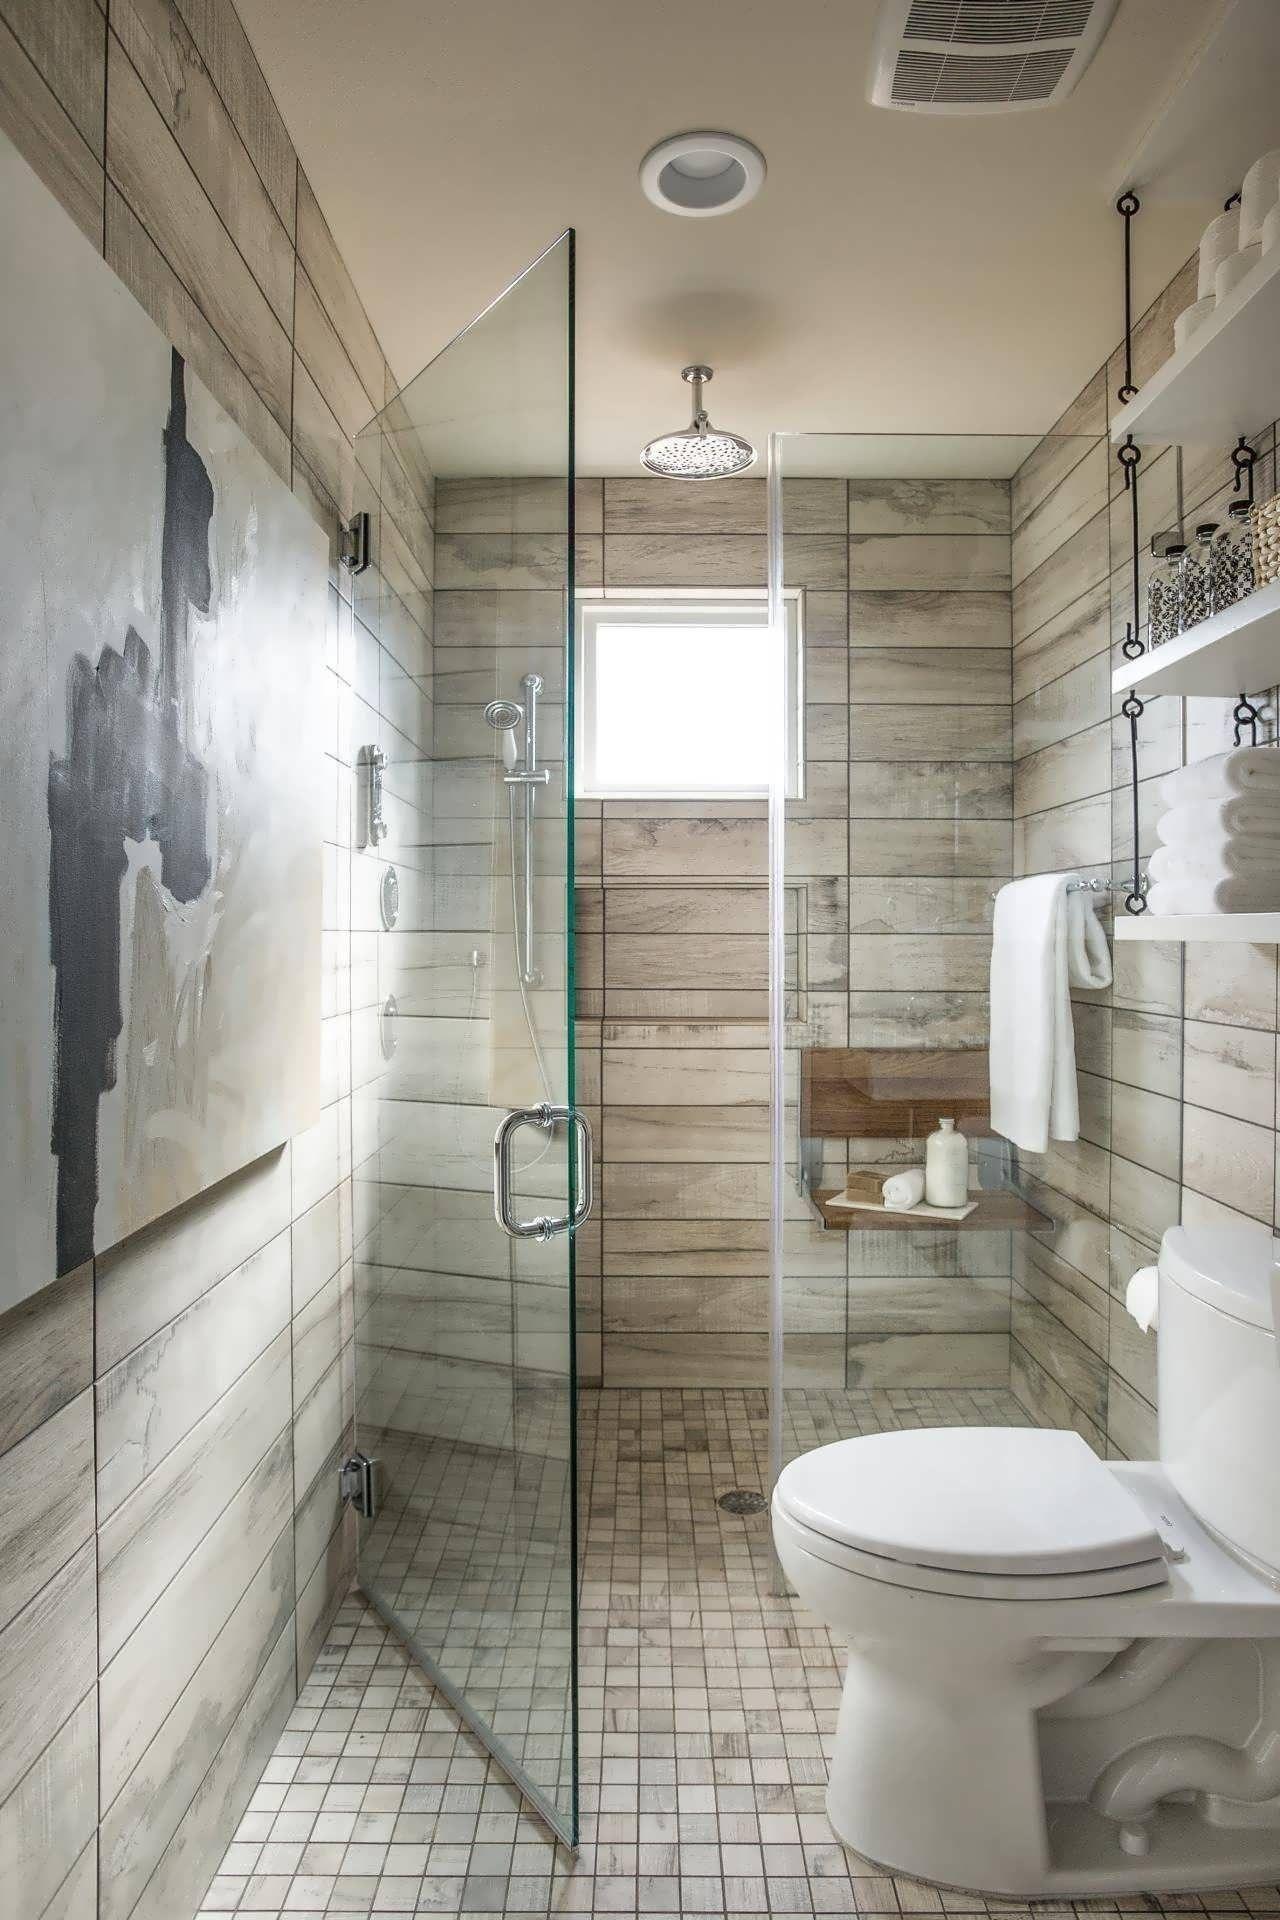 Residential Handicap Bathroom Design 7 Nice Small Bathroom Universal Design Residential Ada In 2020 Bathroom Design Small Bathroom Design Small Farmhouse Bathroom